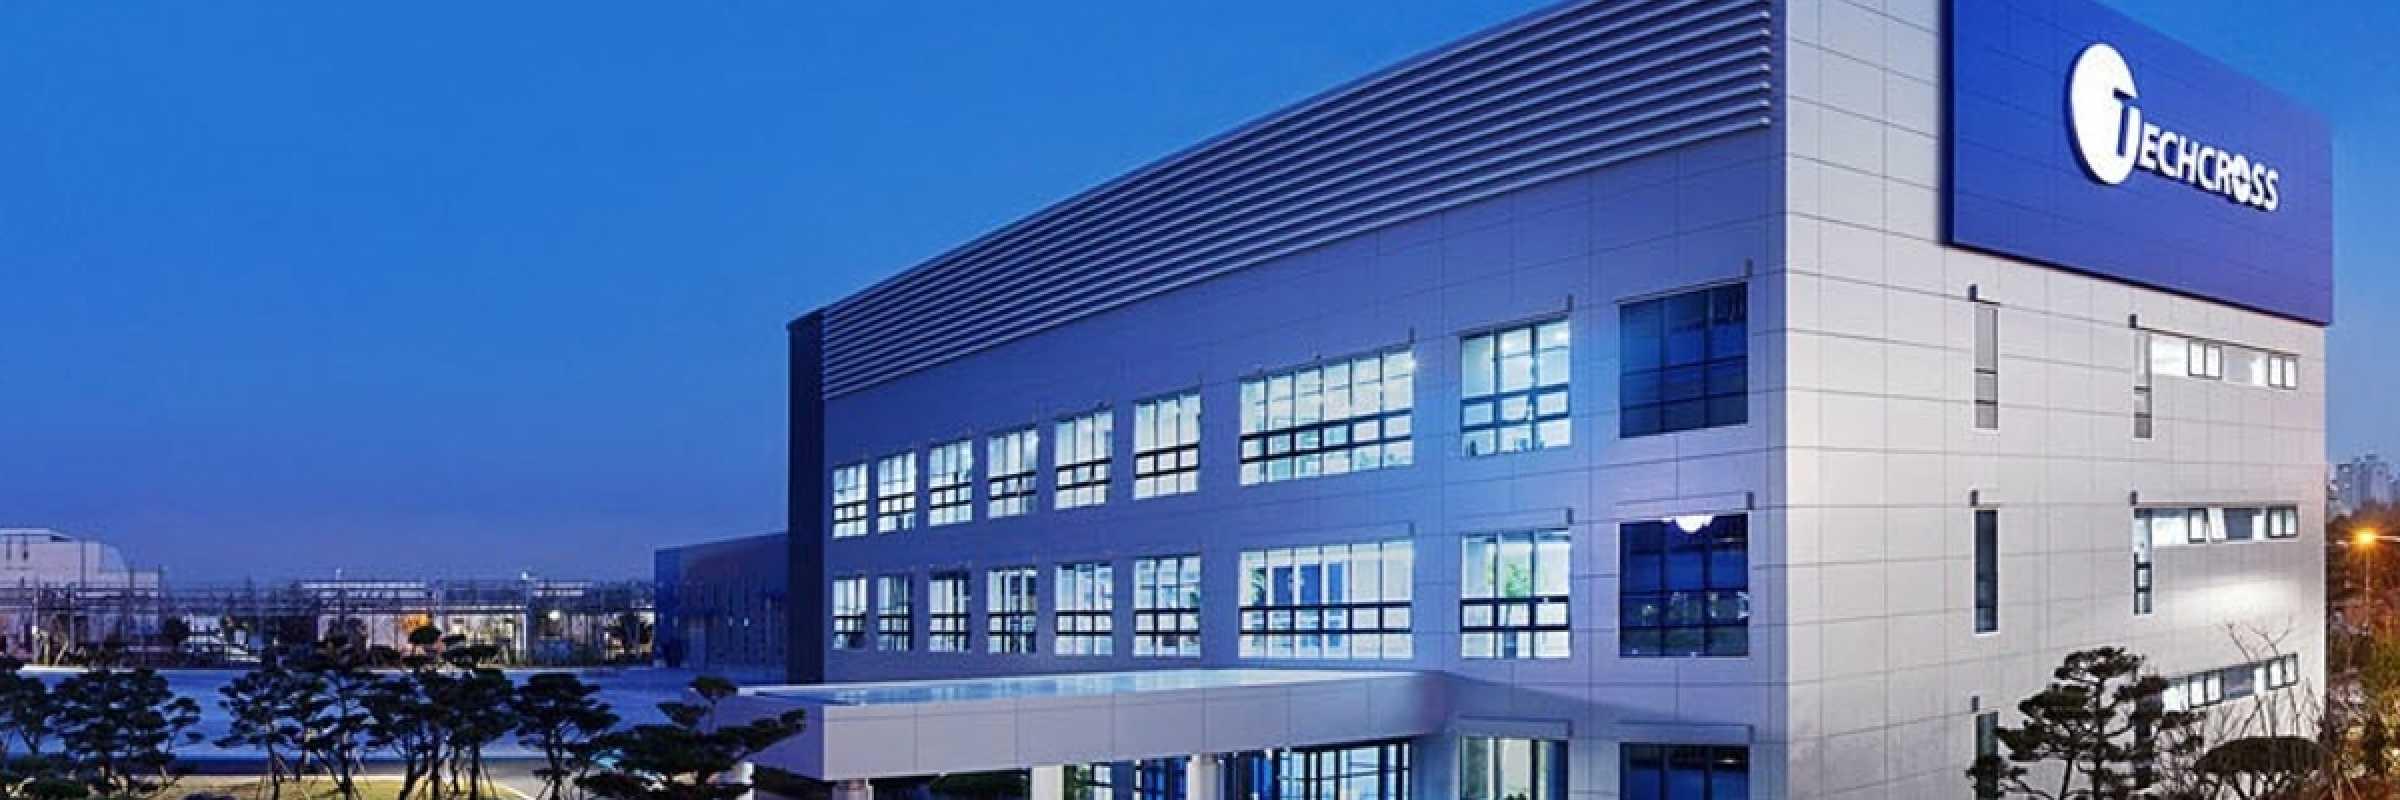 Techcross' new ballast system wins type-approval